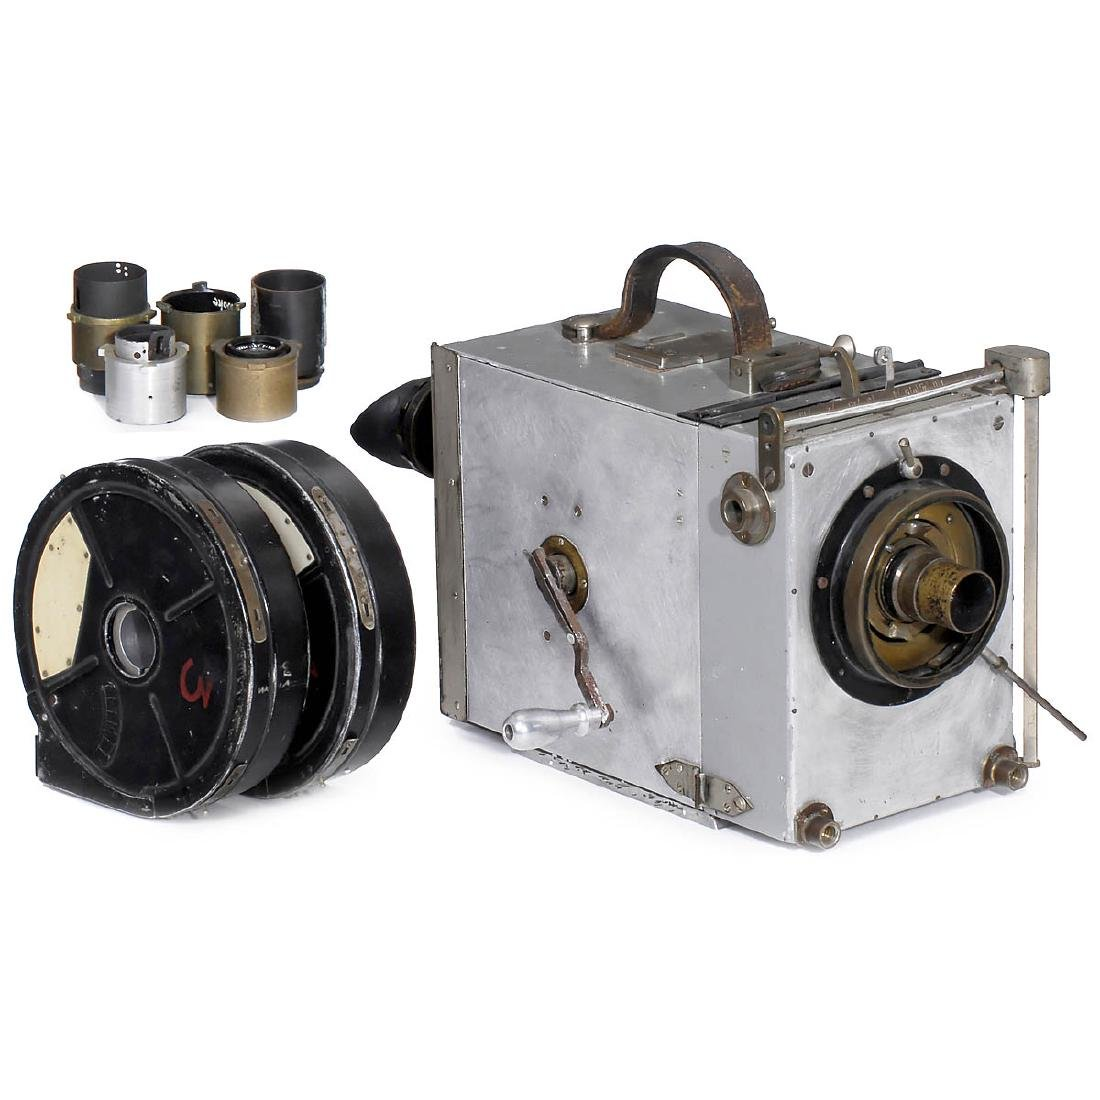 Askania-Universal with 6 Lenses, c. 1924